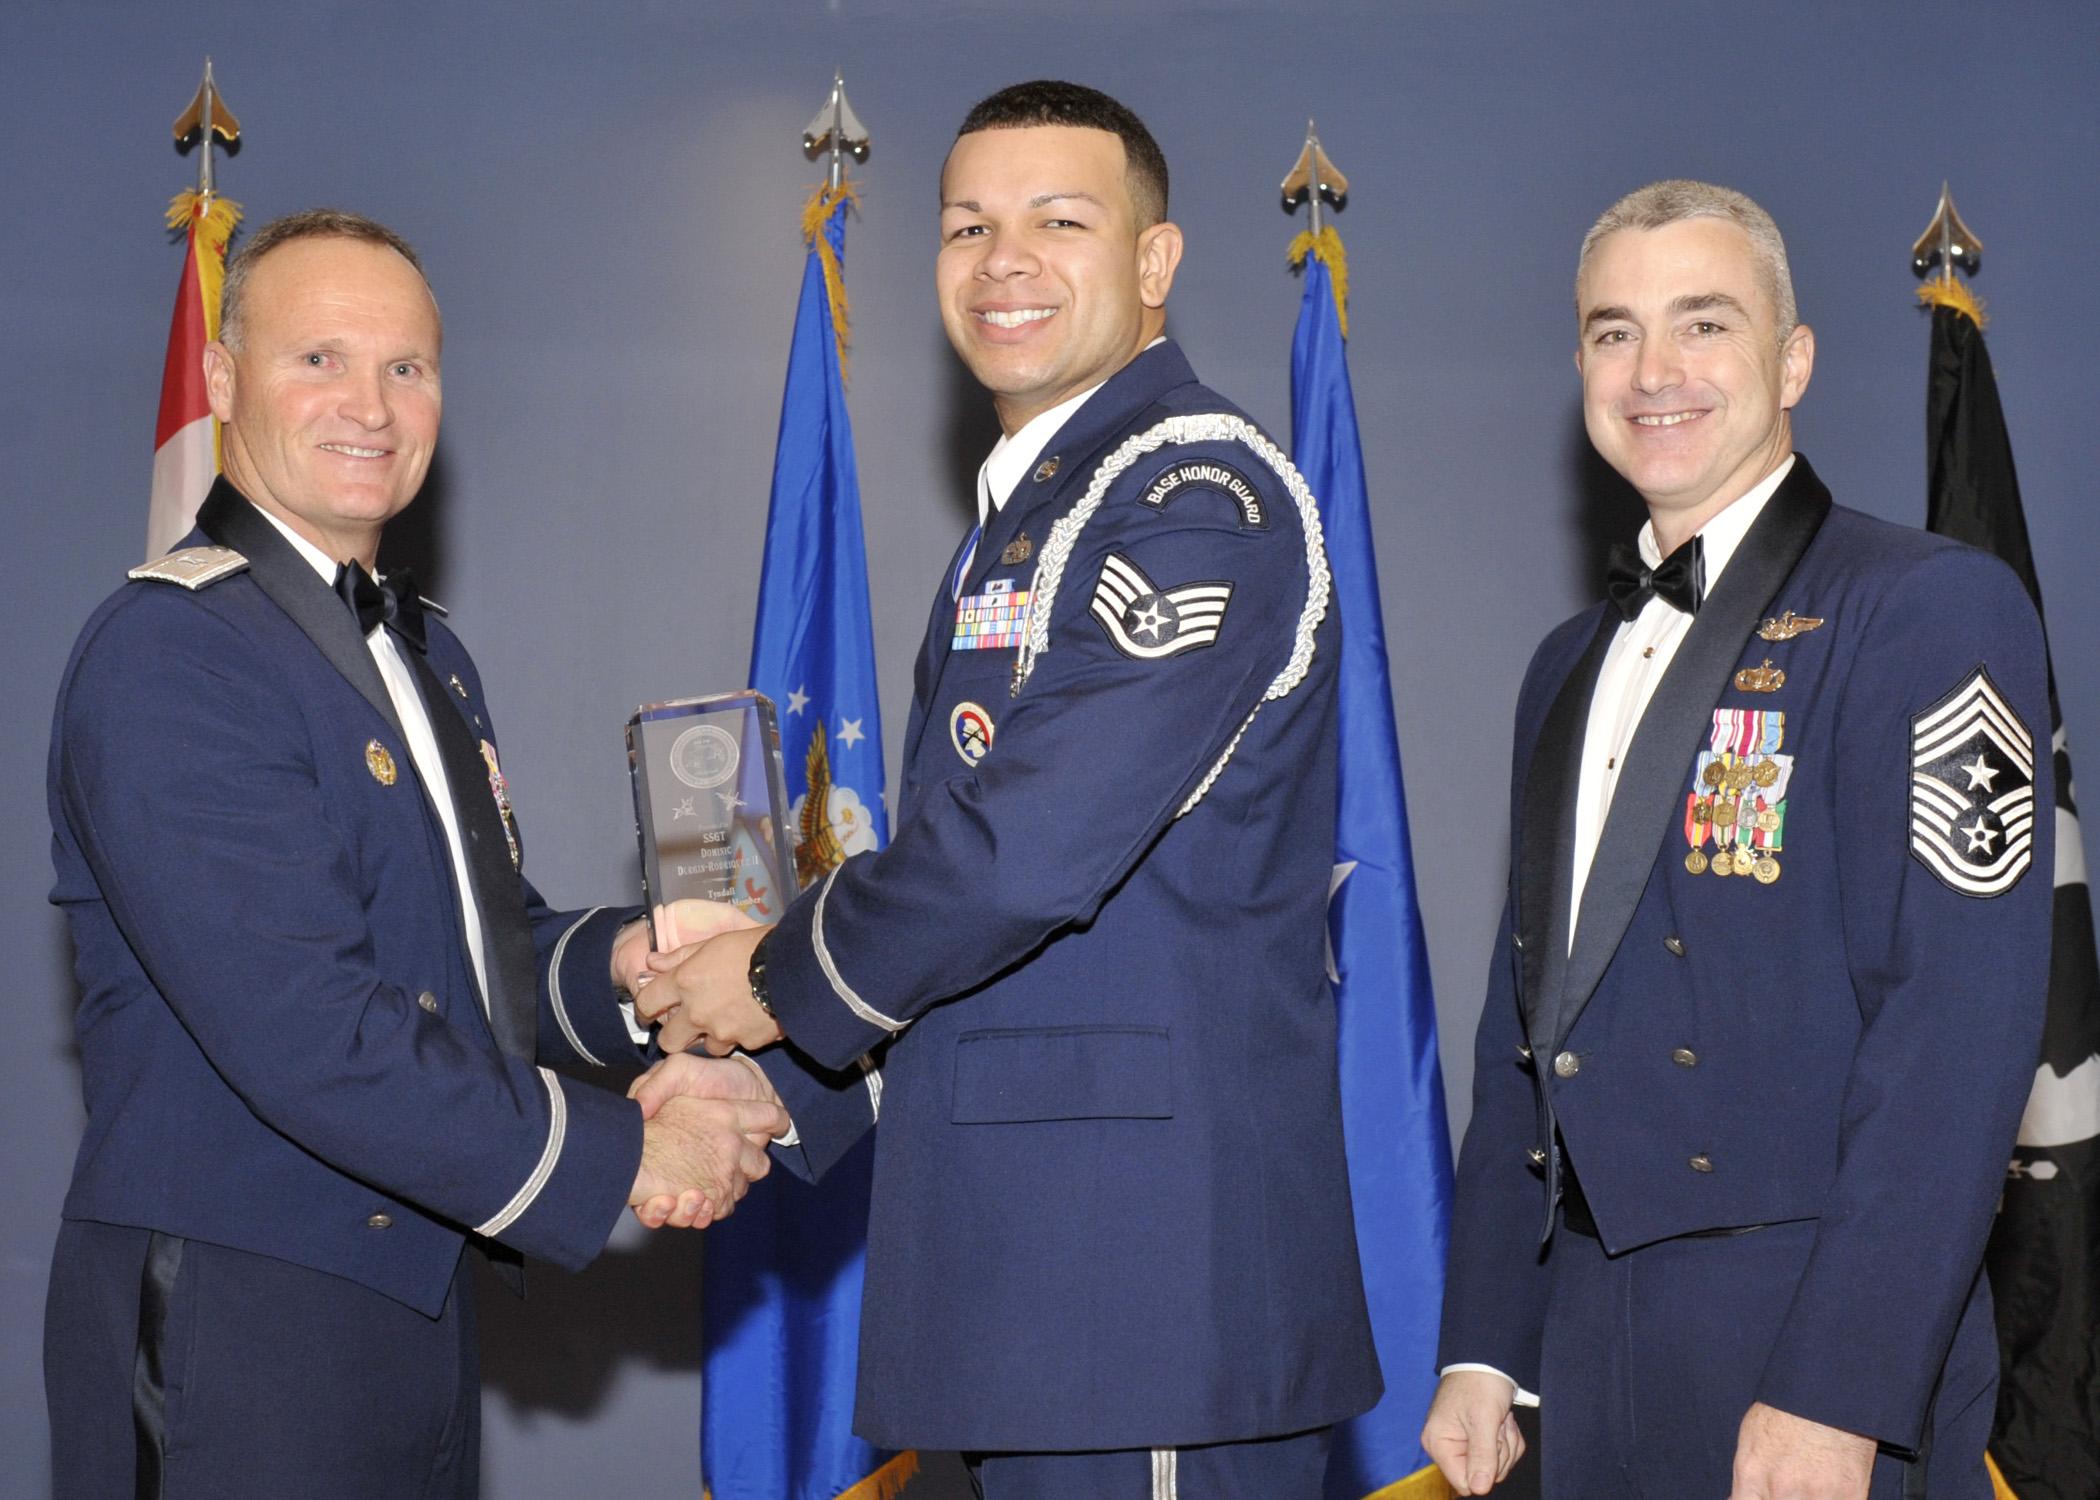 Tyndall sergeant earns Detachment NCO of the Year award